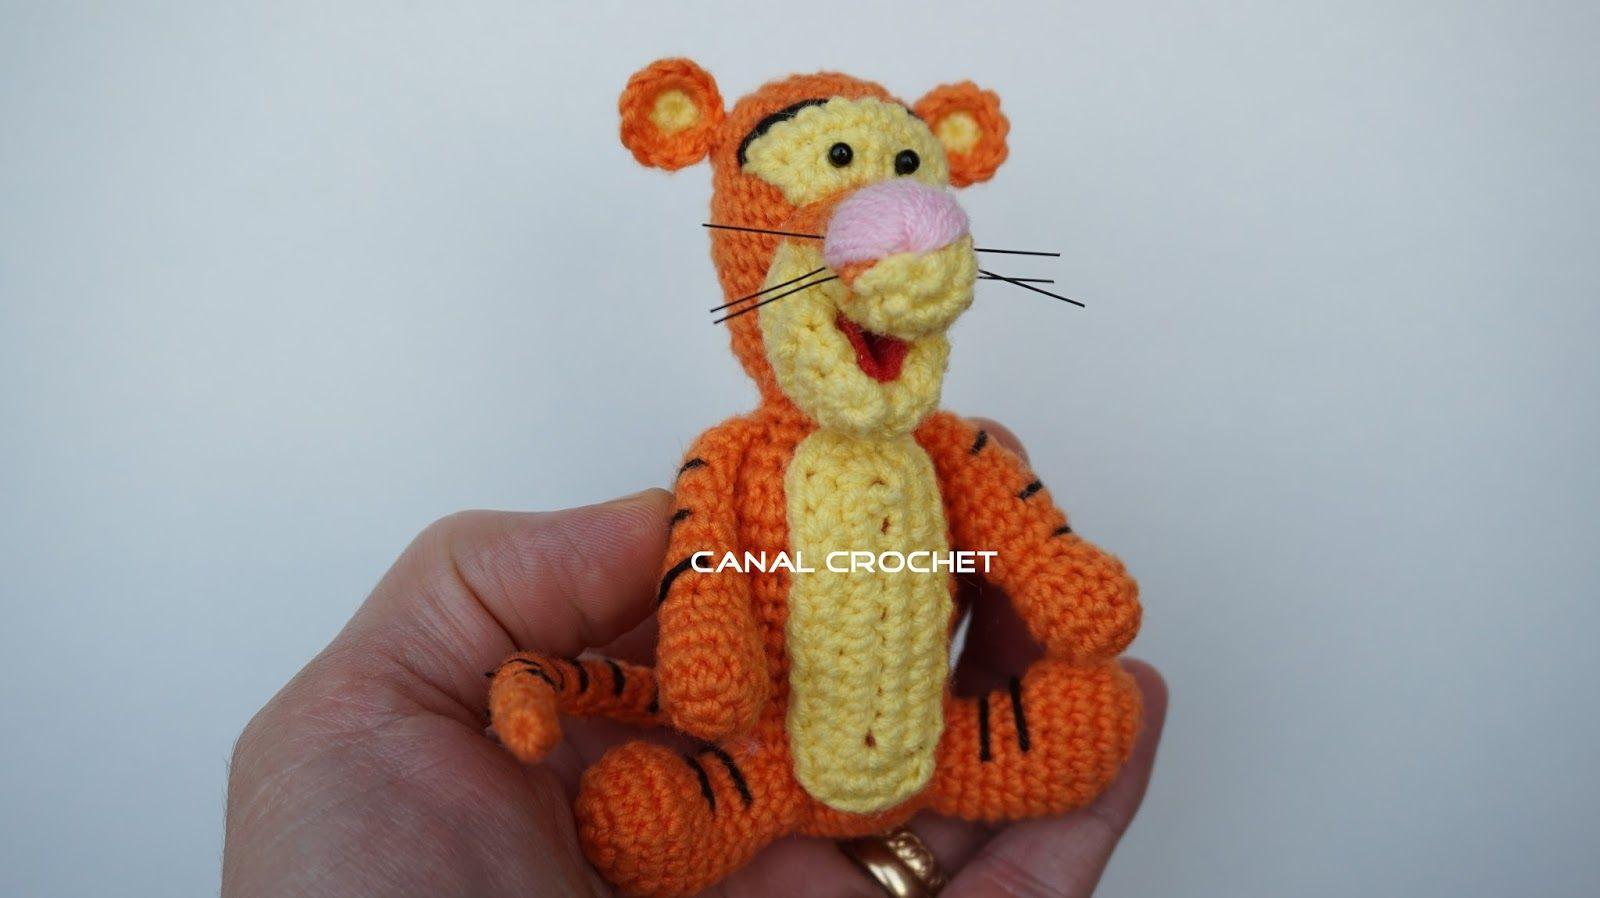 Amigurumi Lion Perritos : Free crochet pattern for tigger by canal crochet perros y animales